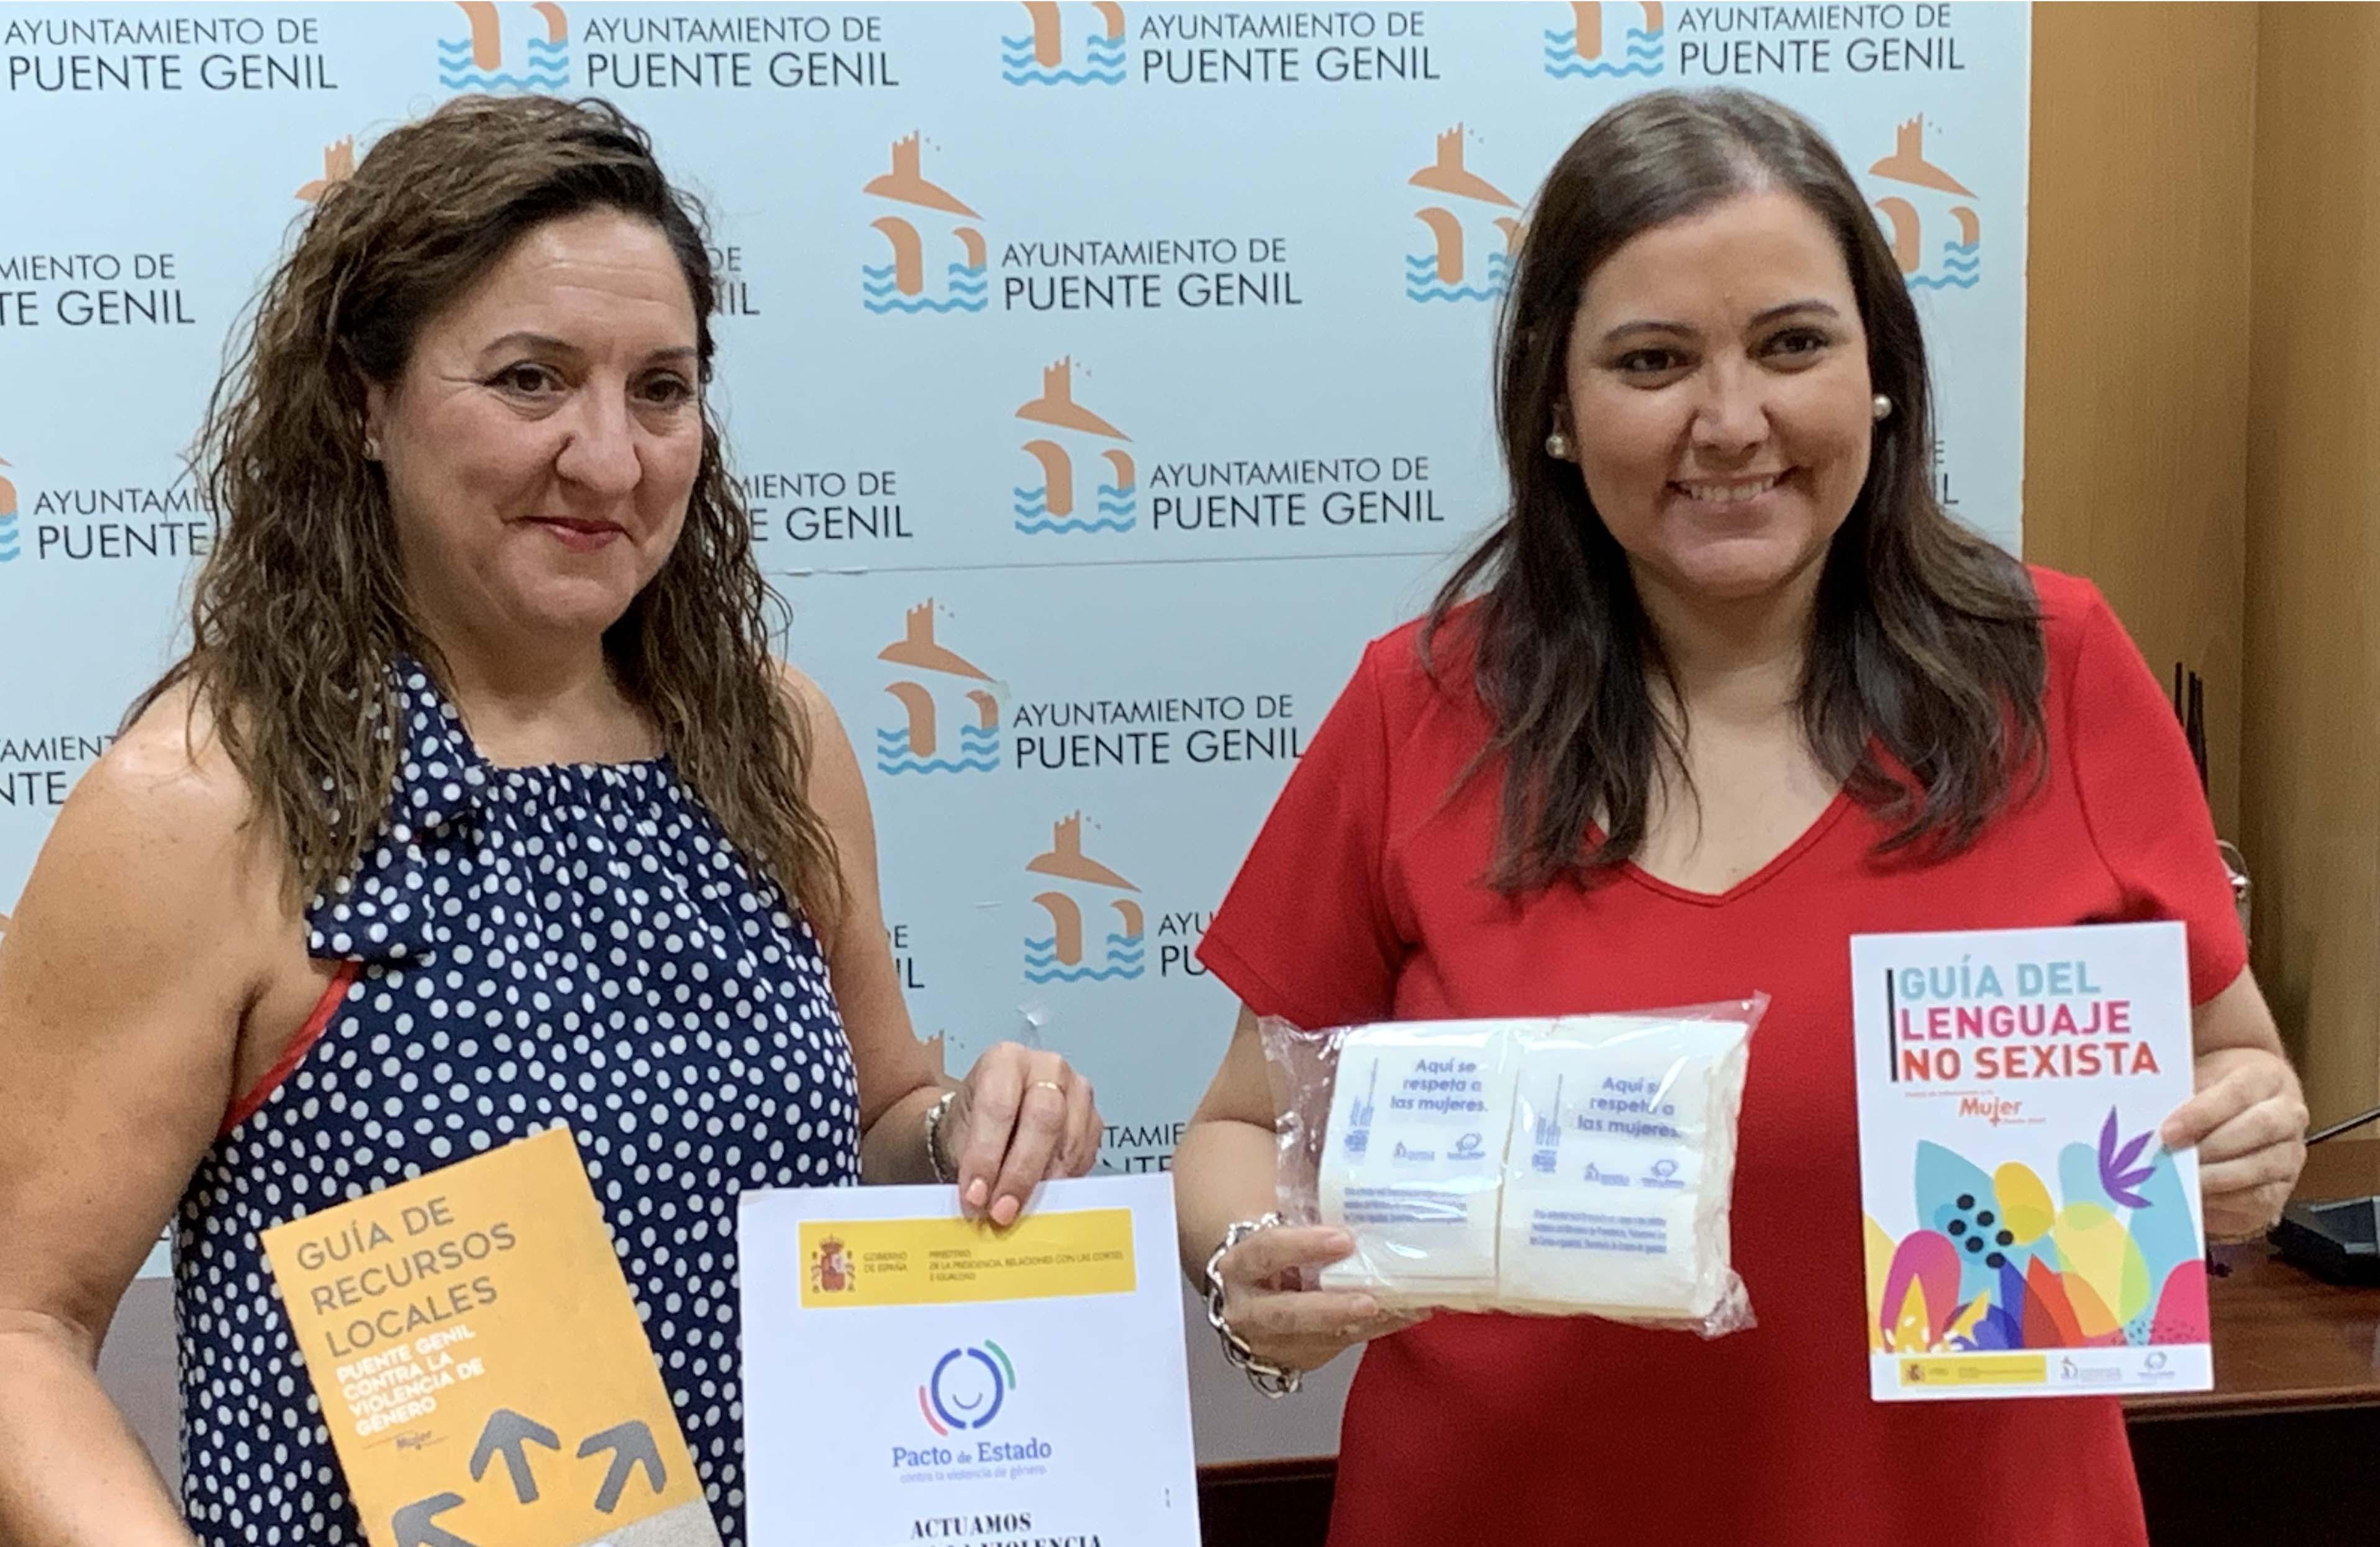 Mariola González y Ana Carrillo